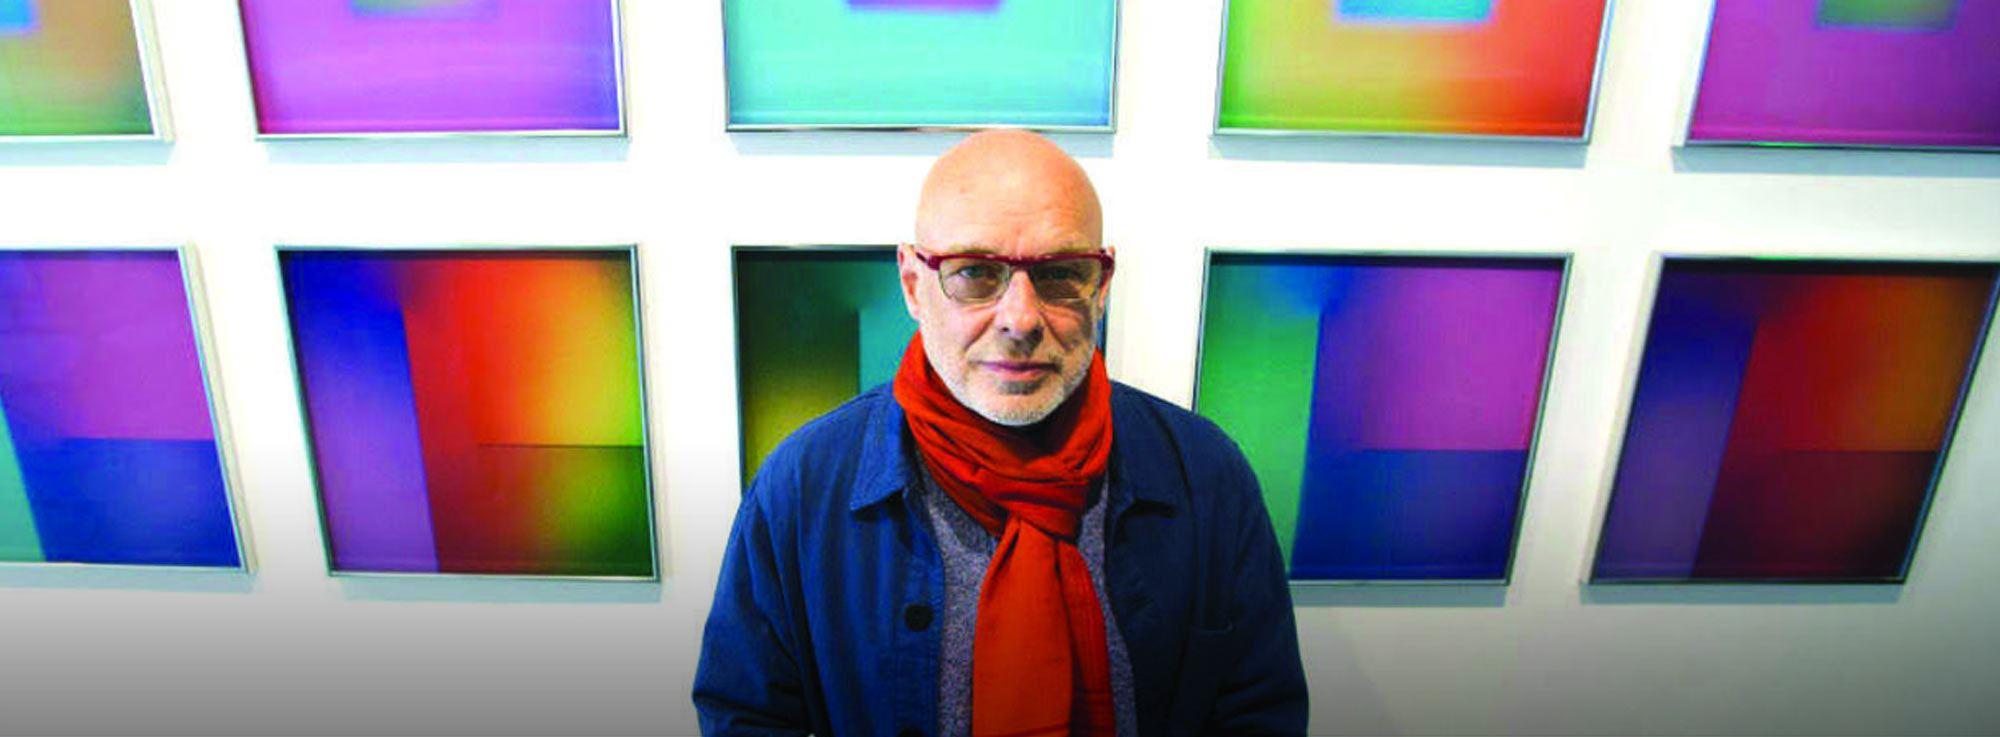 Trani: Mostra Light music - ospite Brian Eno